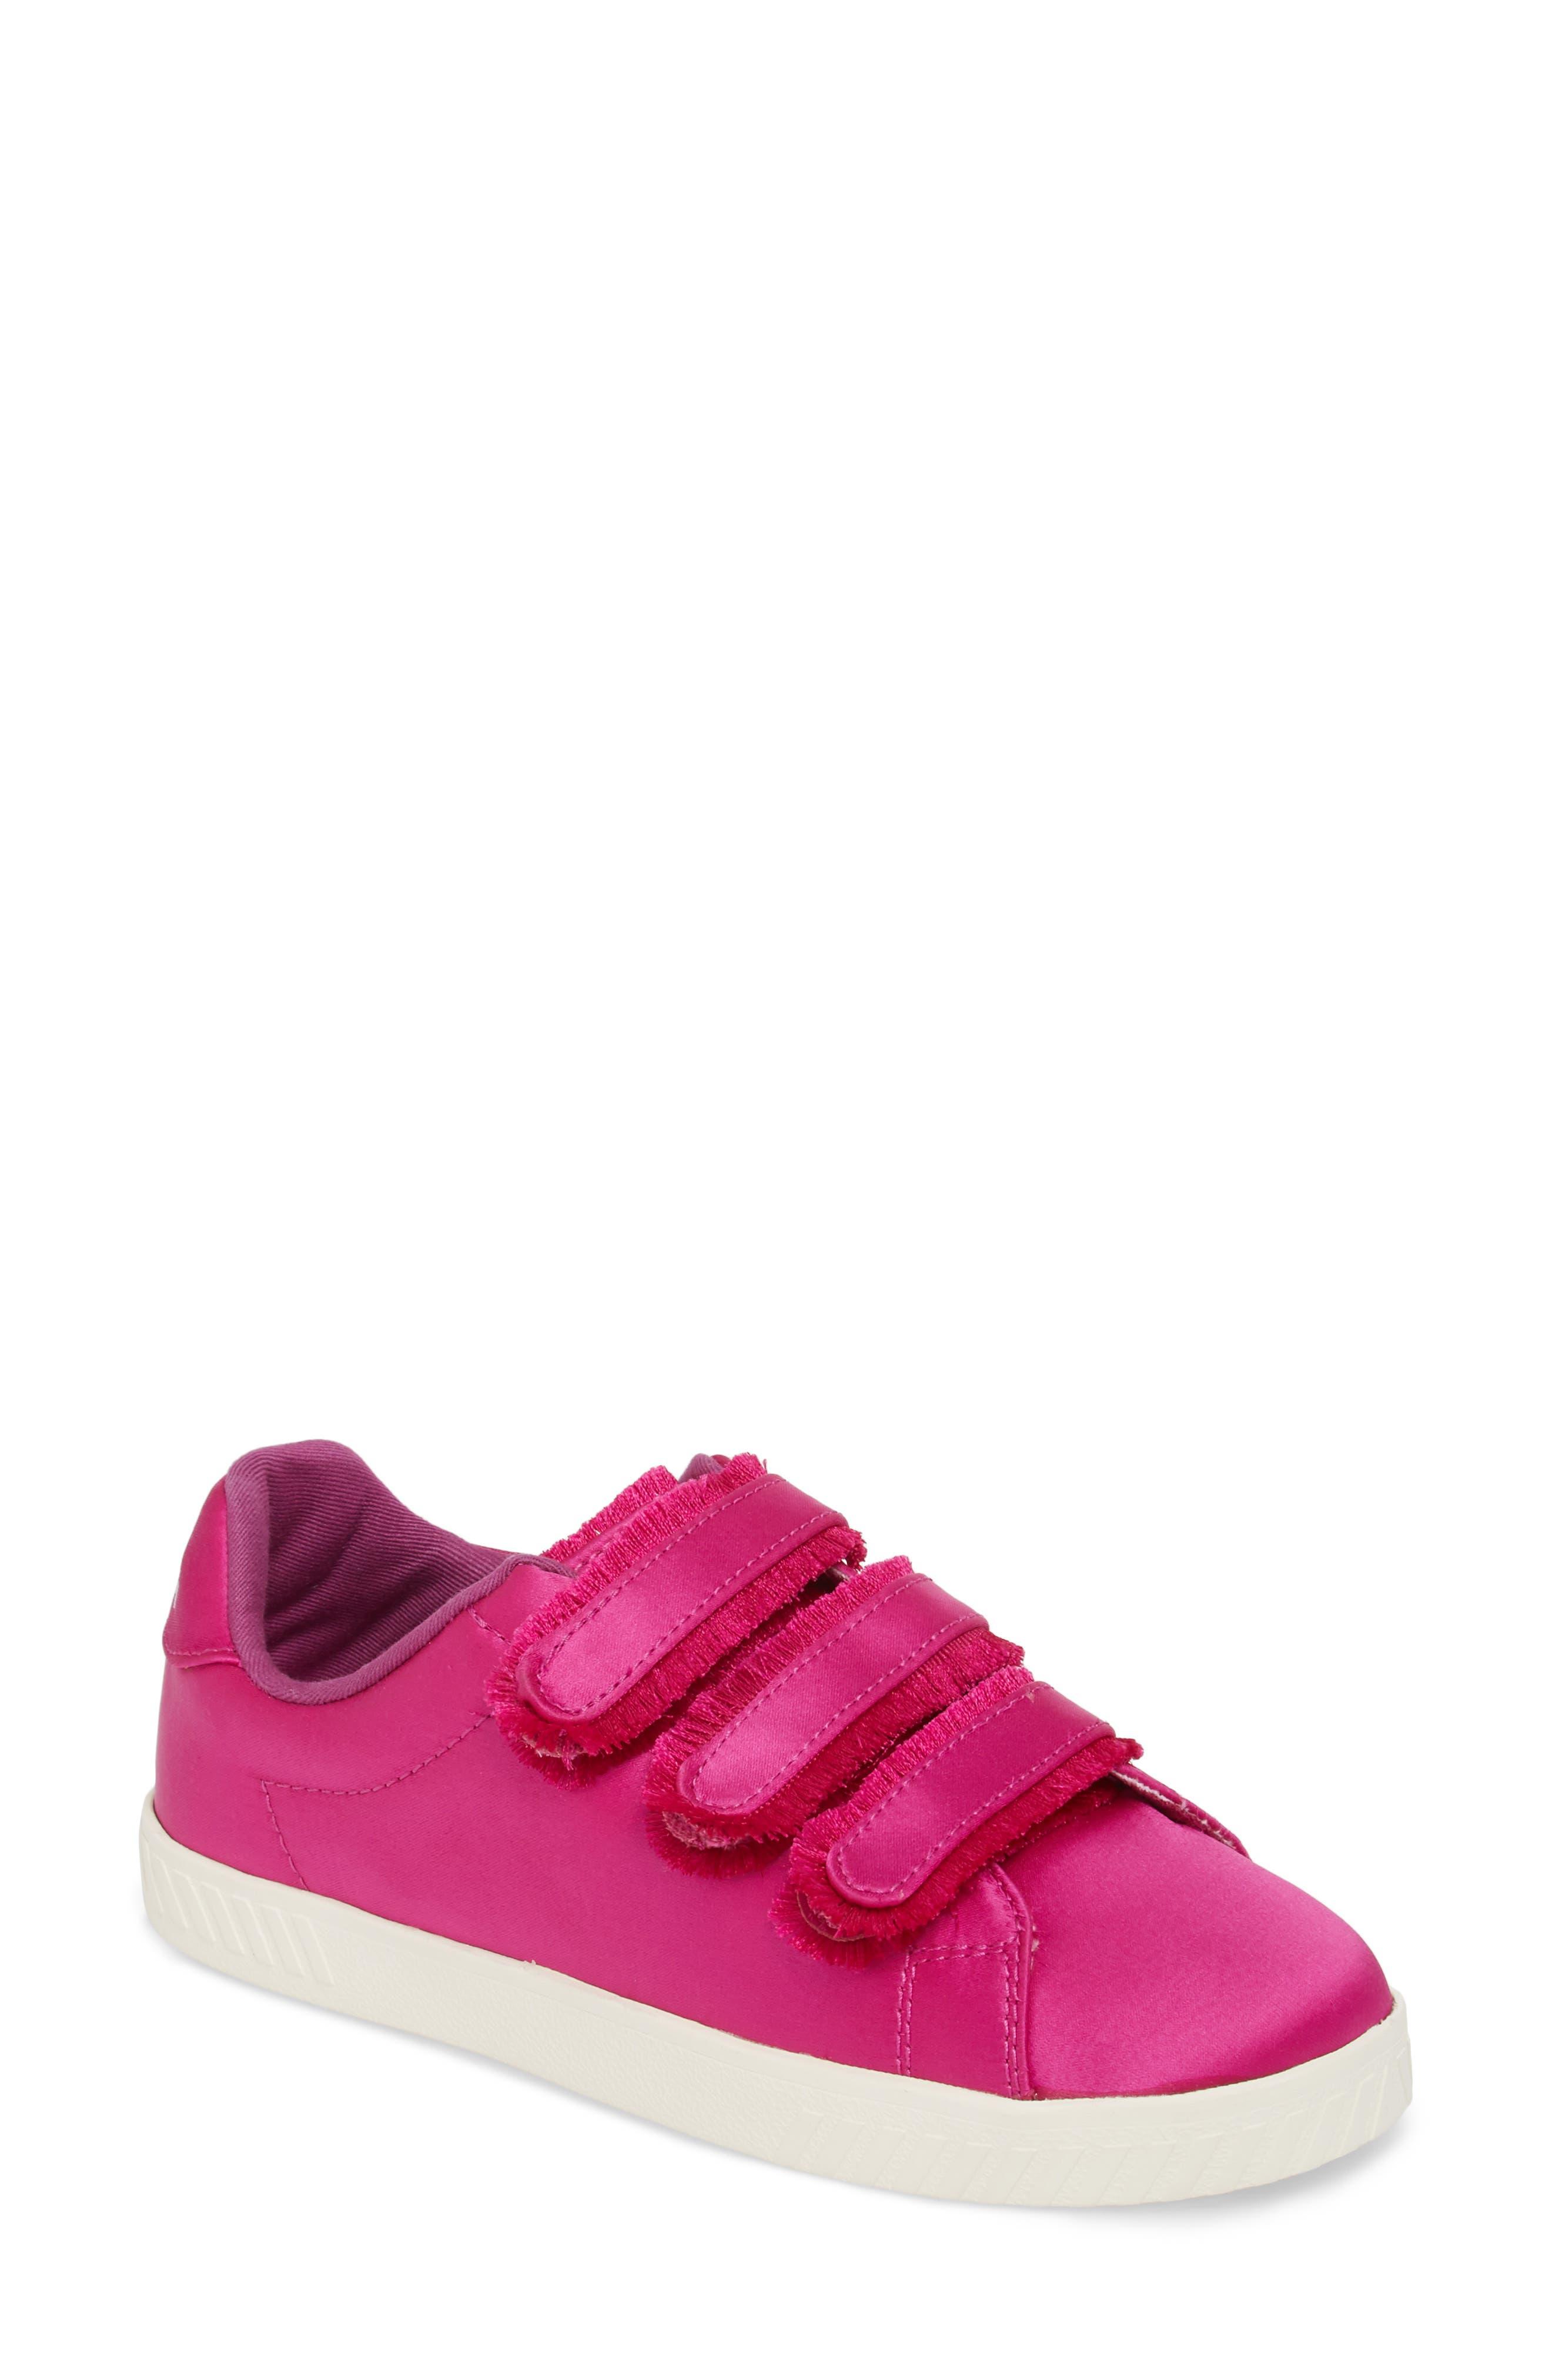 Fringed Strap Sneaker,                         Main,                         color, FUCHSIA SATIN